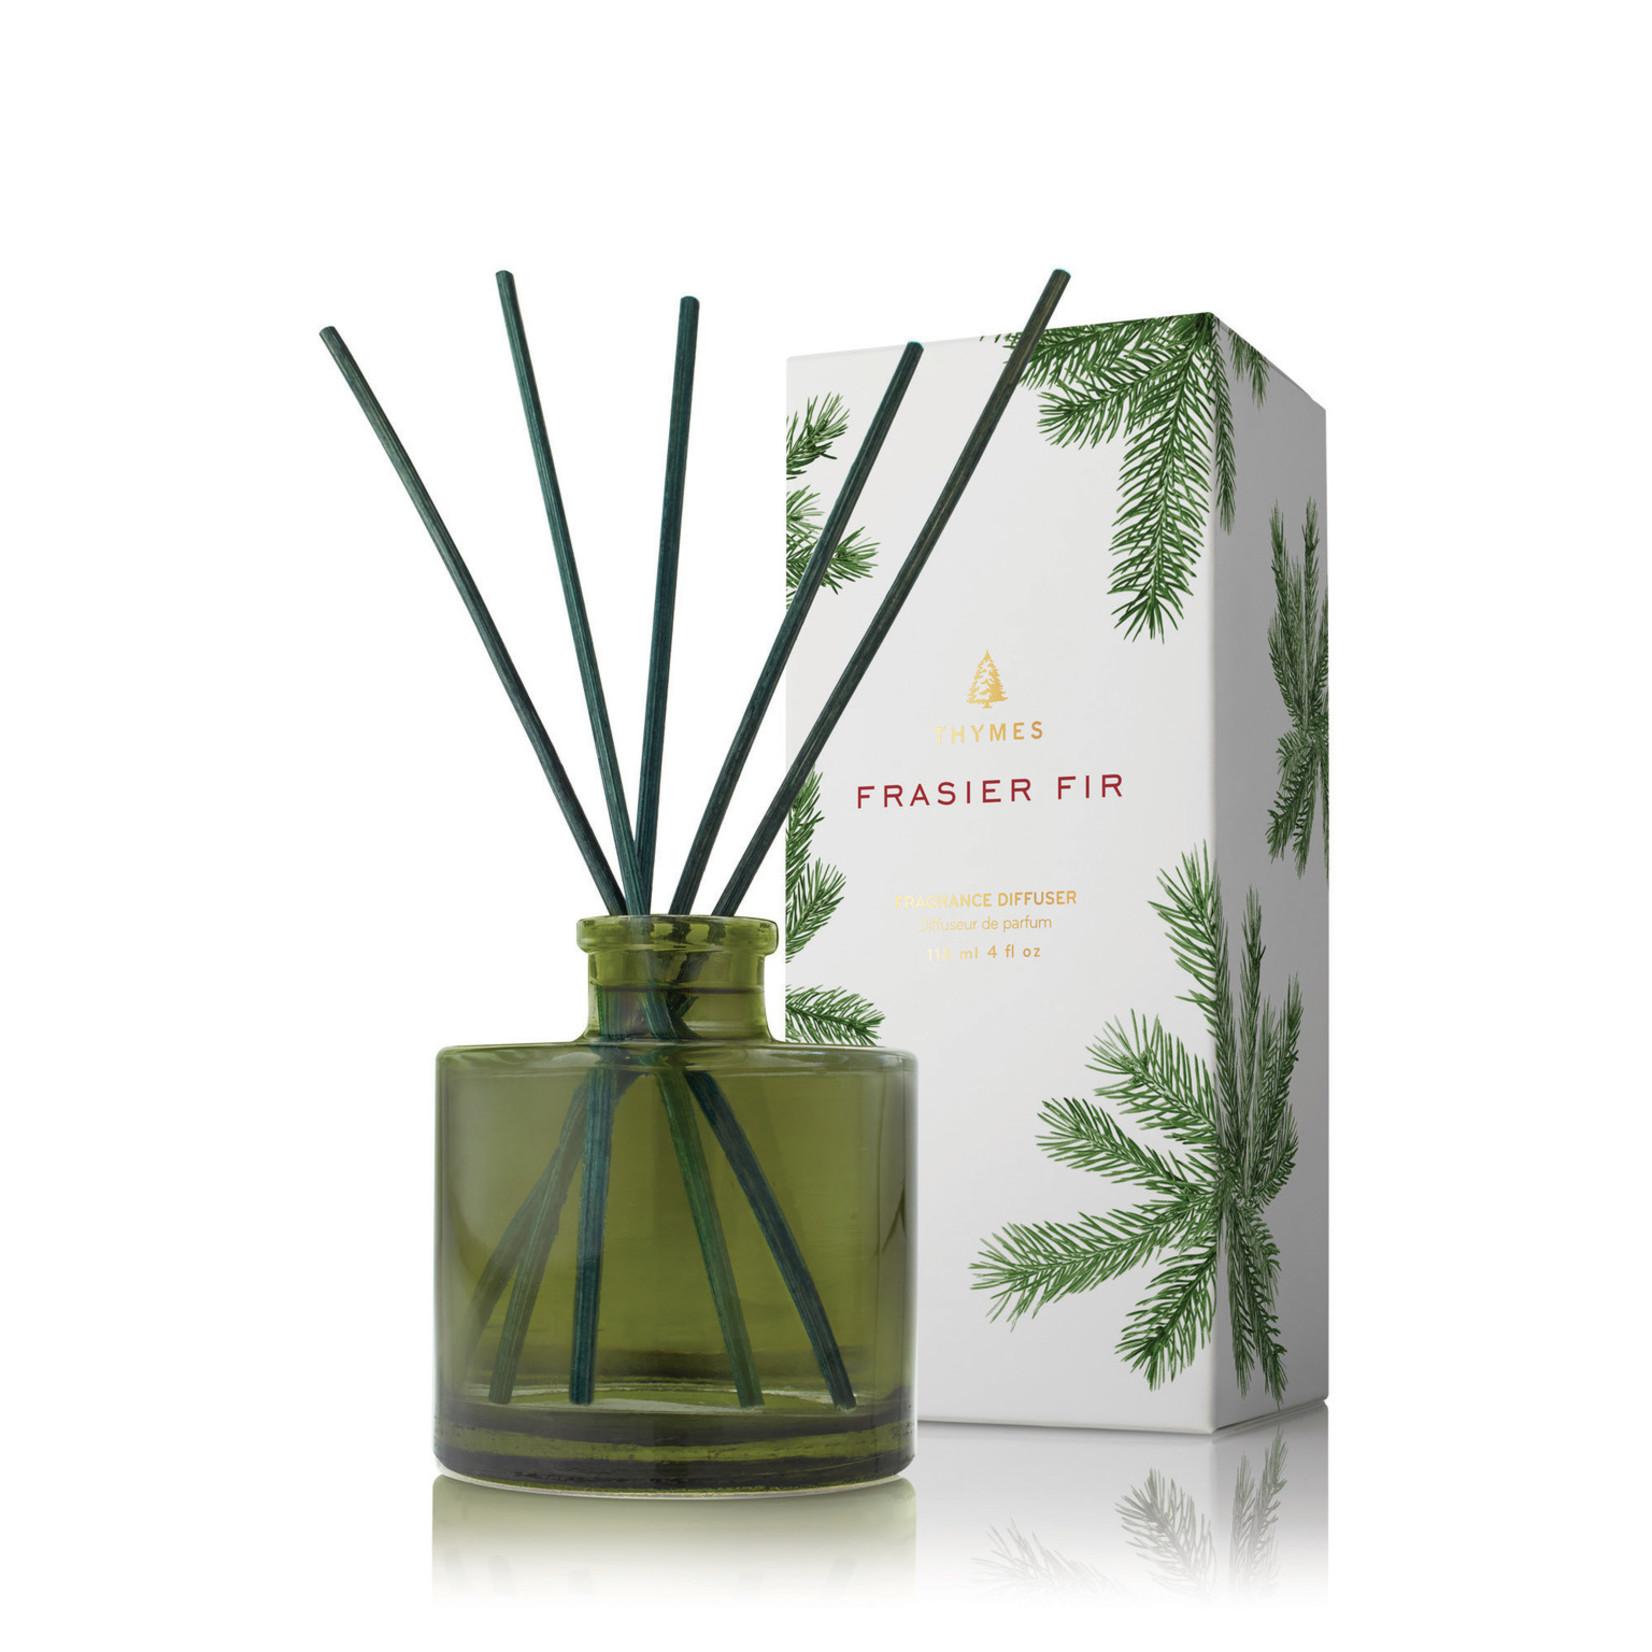 Thymes Frasier Fir Fragrance Diffuser